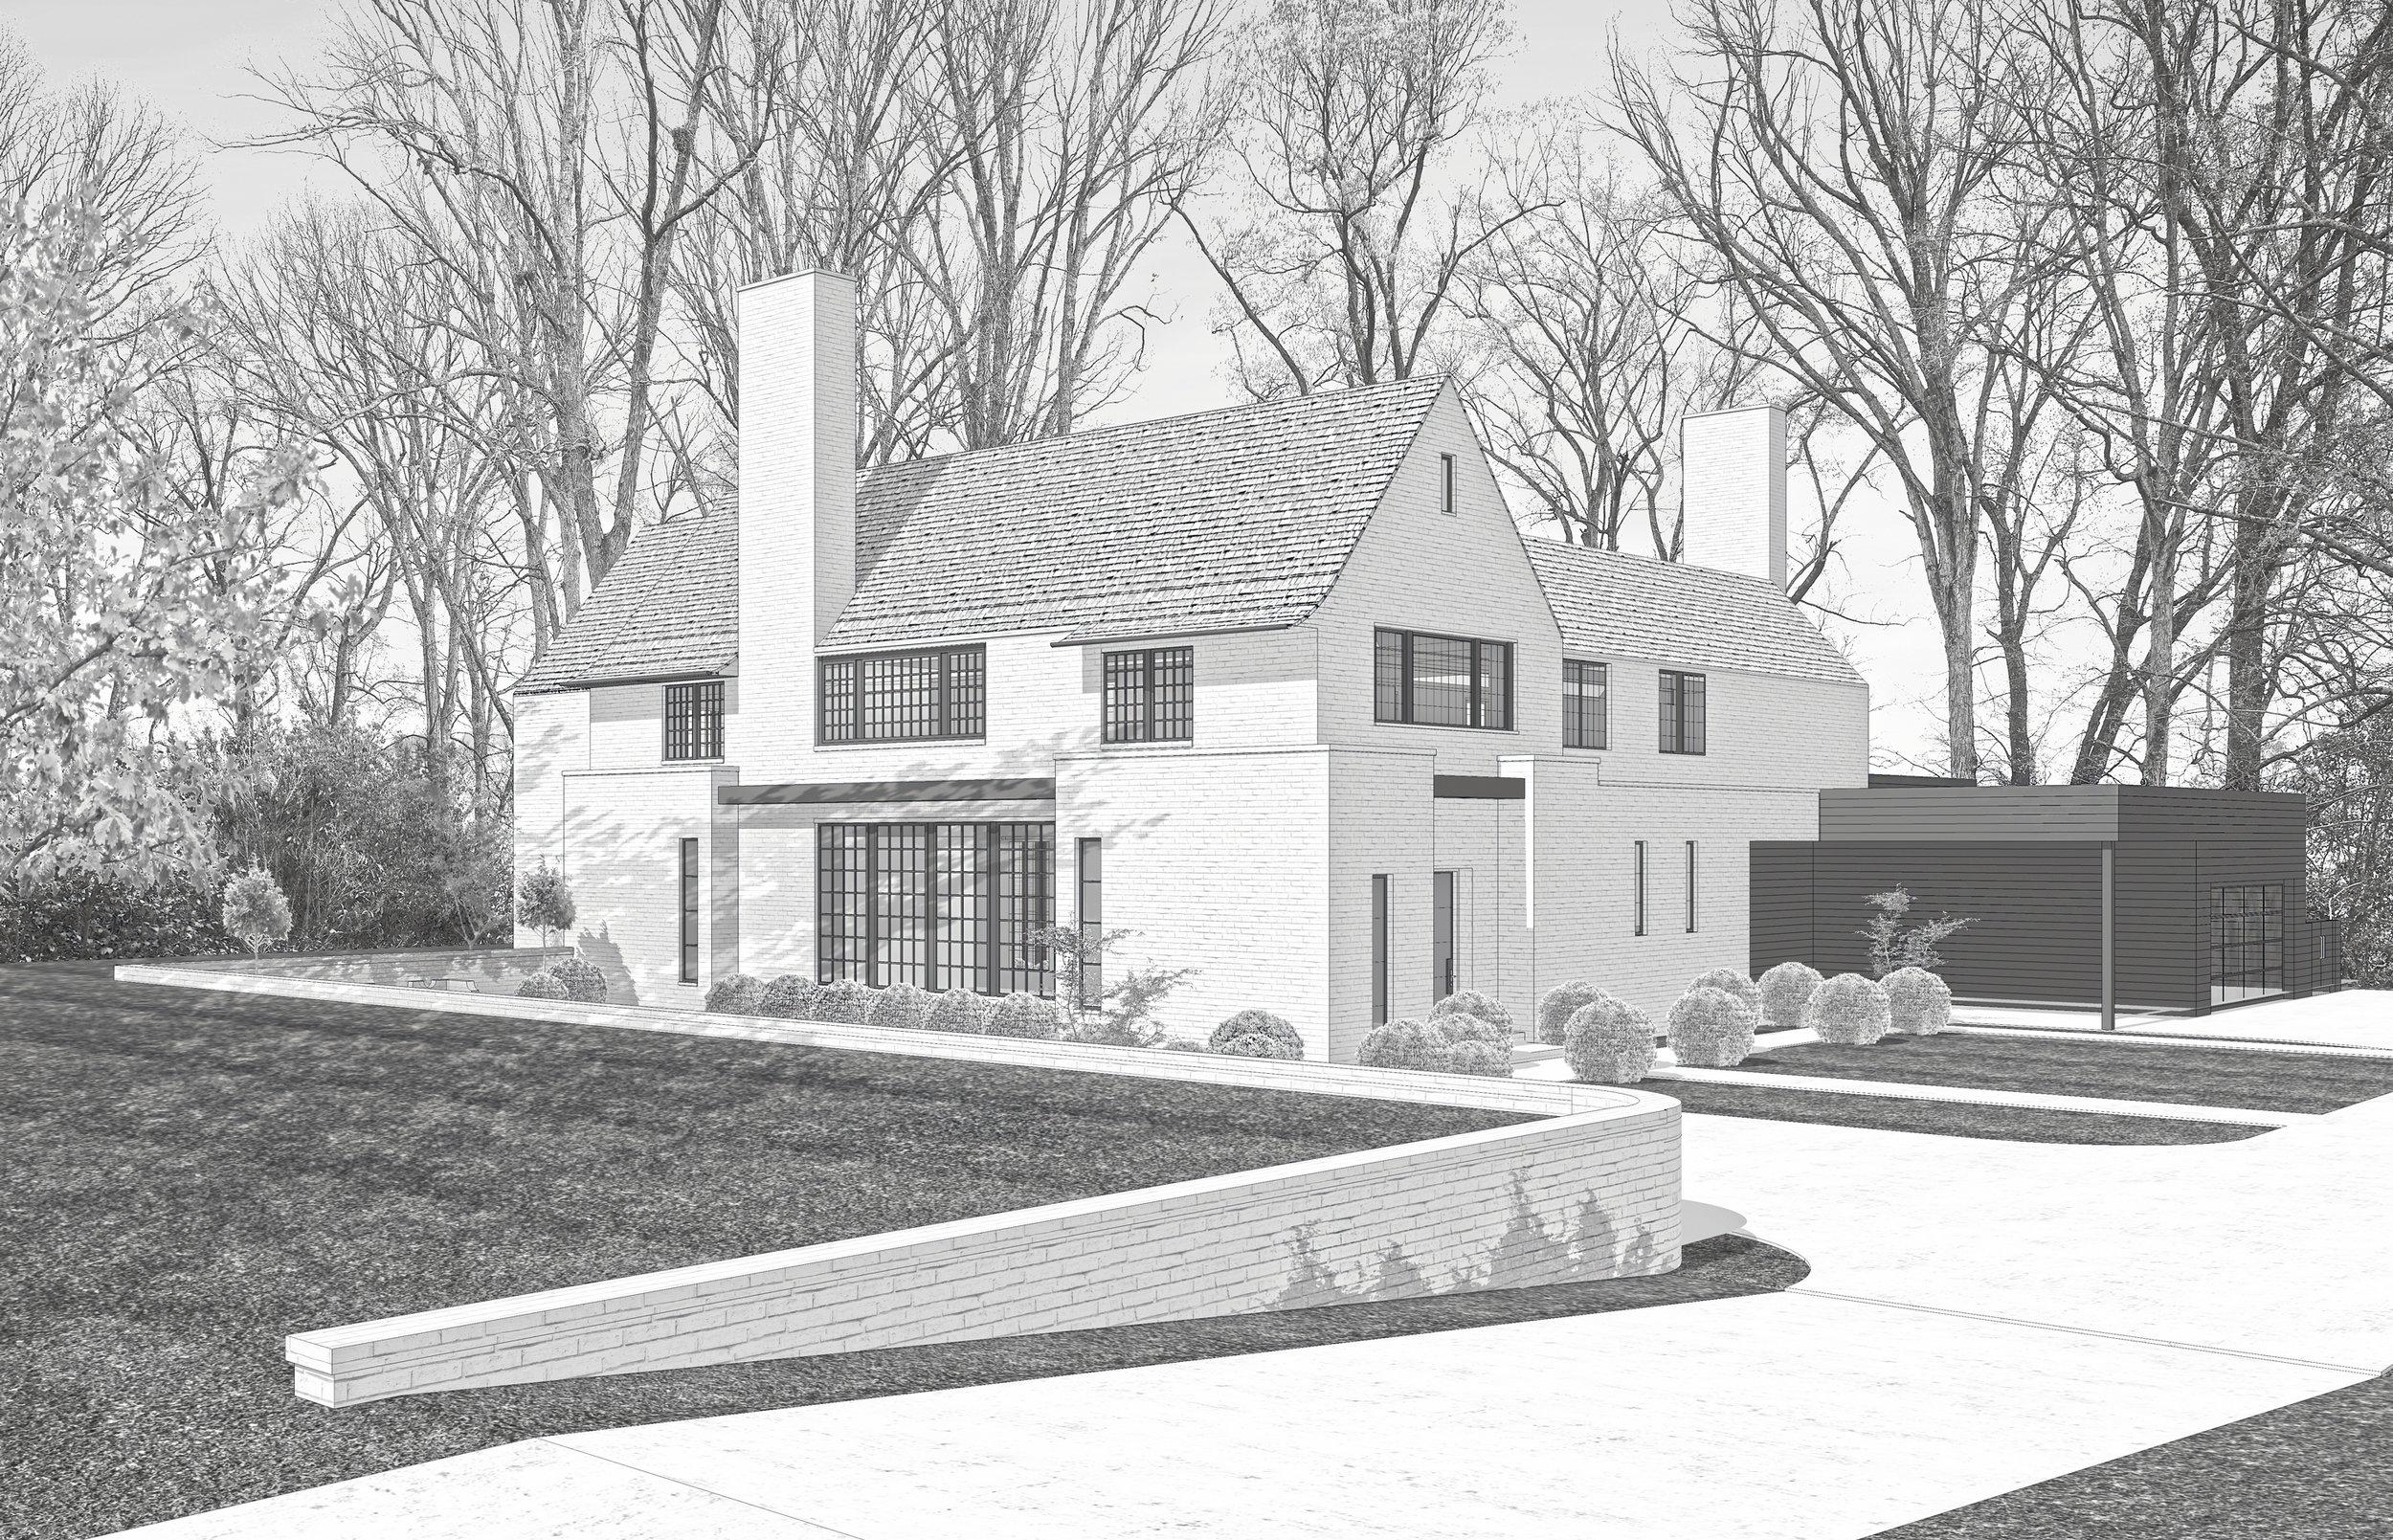 Strickland_Building_Group_4052_ARBORWAY_Charlotte_North_Carolina_Google_SketchupPro_Rendering.jpg